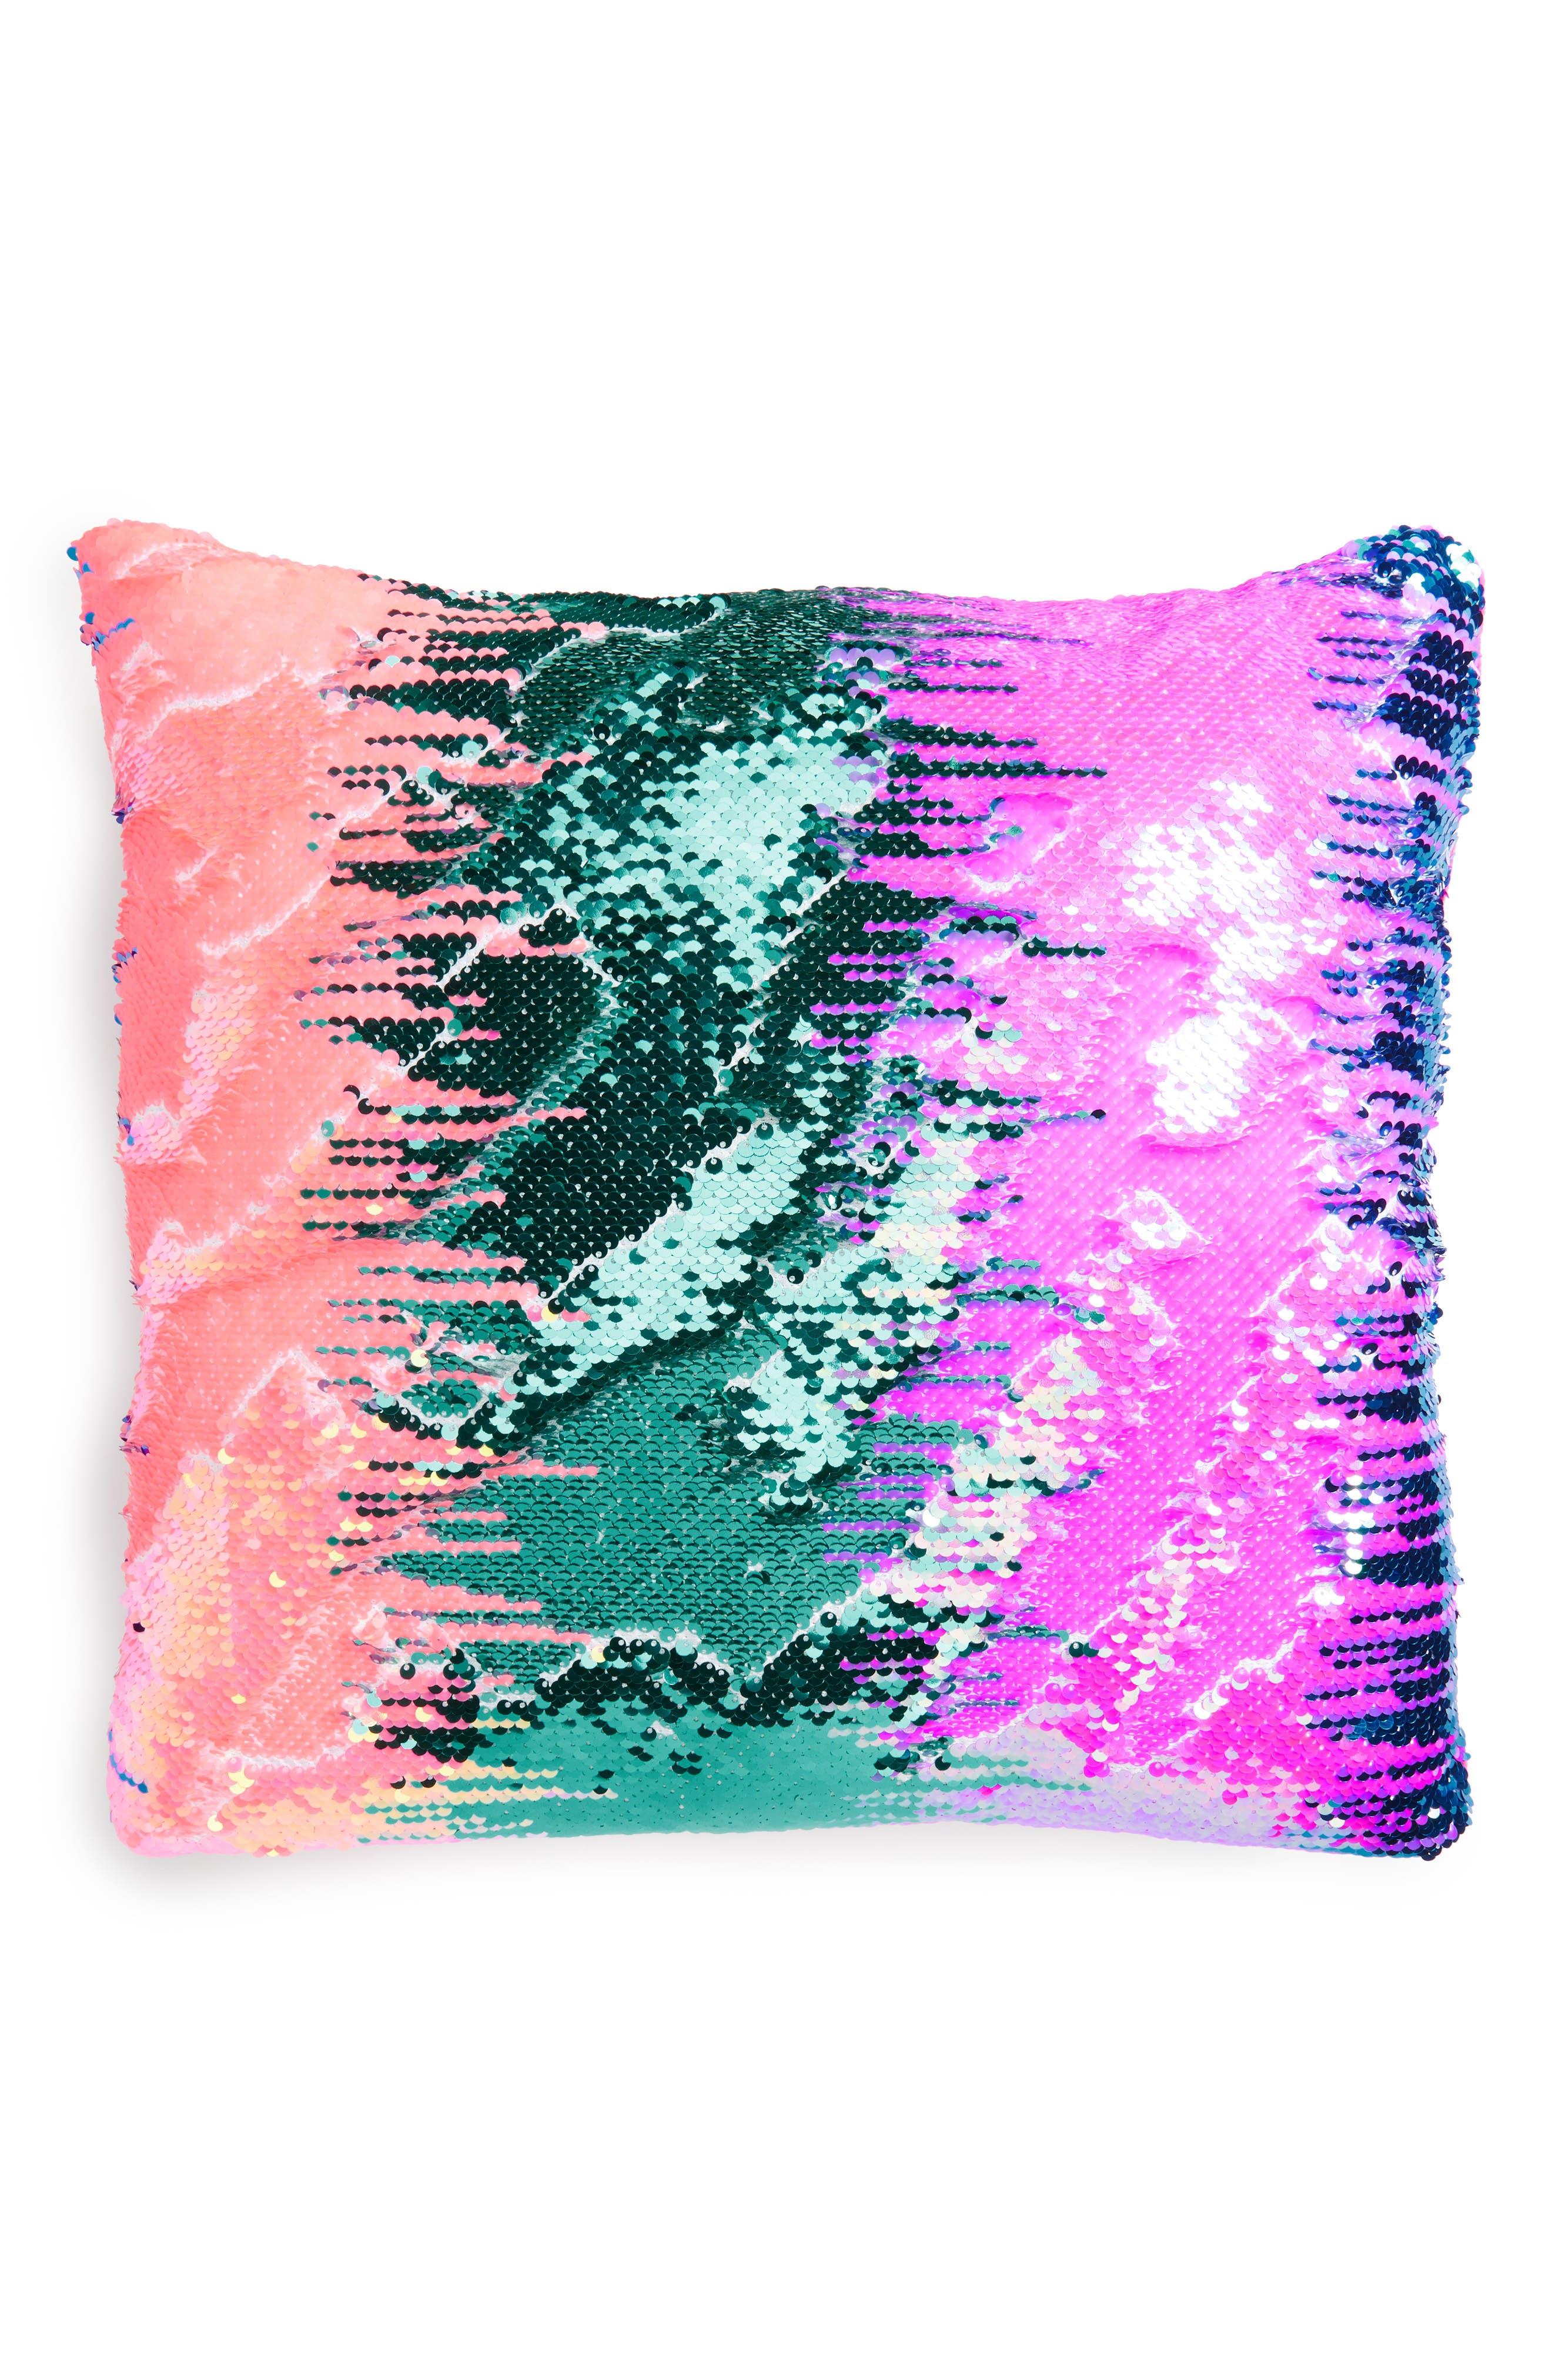 Magic Flip Sequin Velvet Accent Pillow,                         Main,                         color, GRADIENT